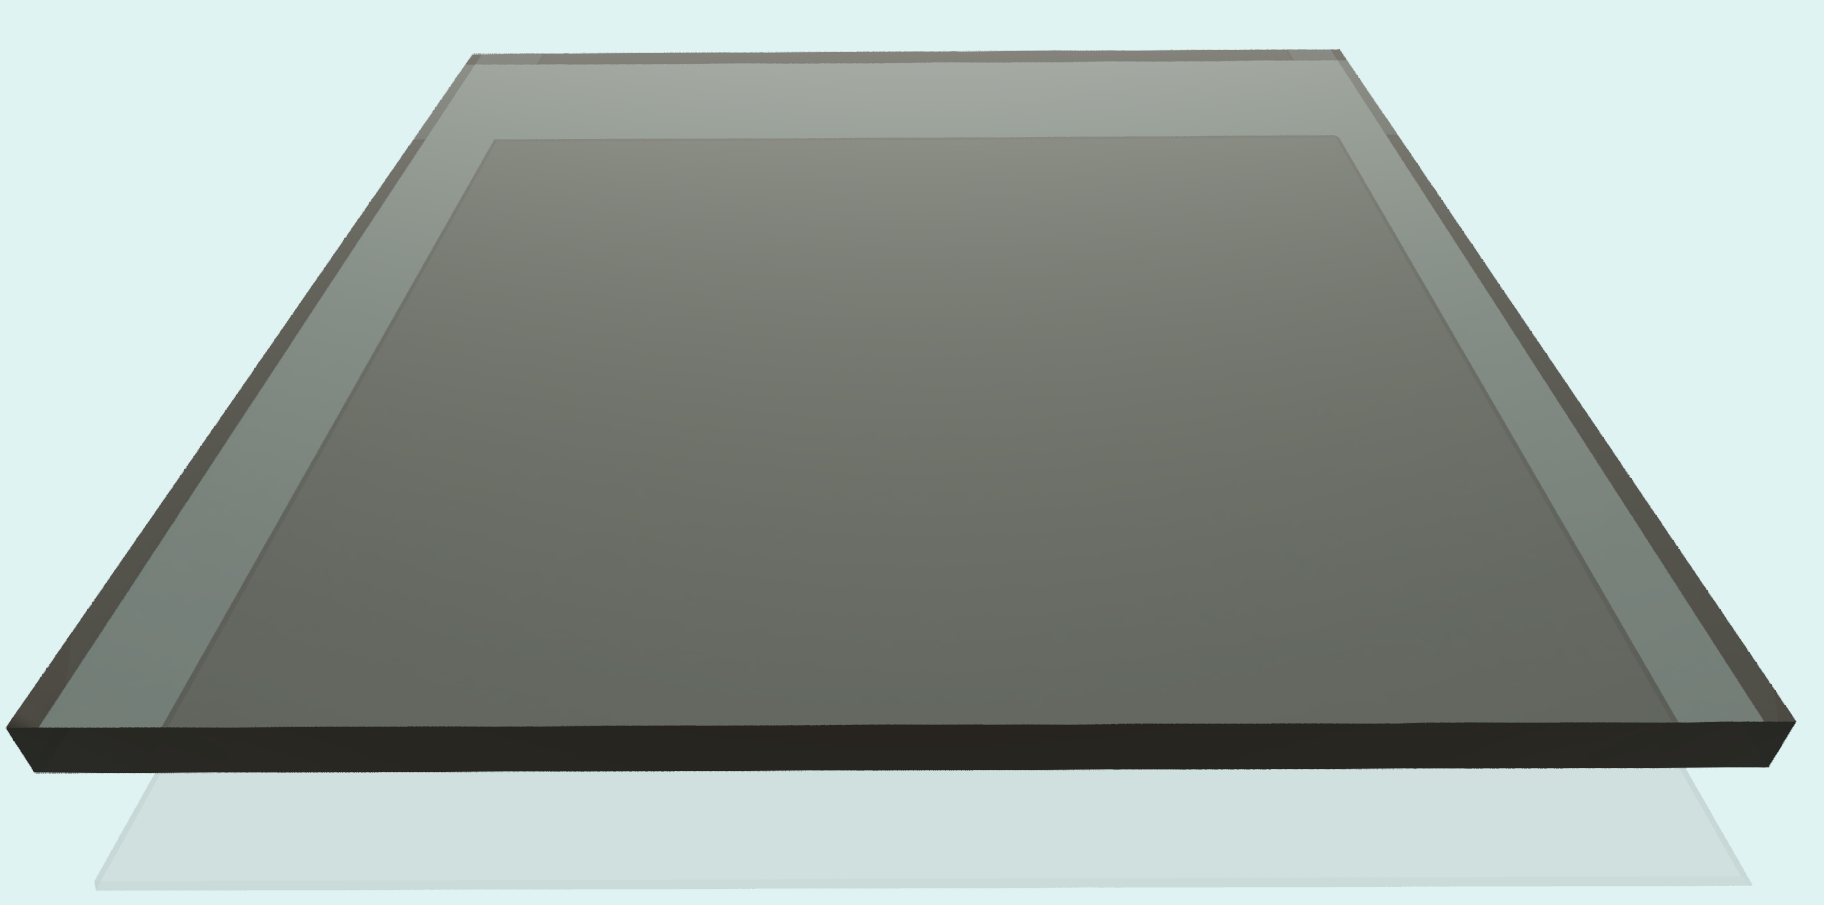 Plexiglas 8 mm, rauchfarben